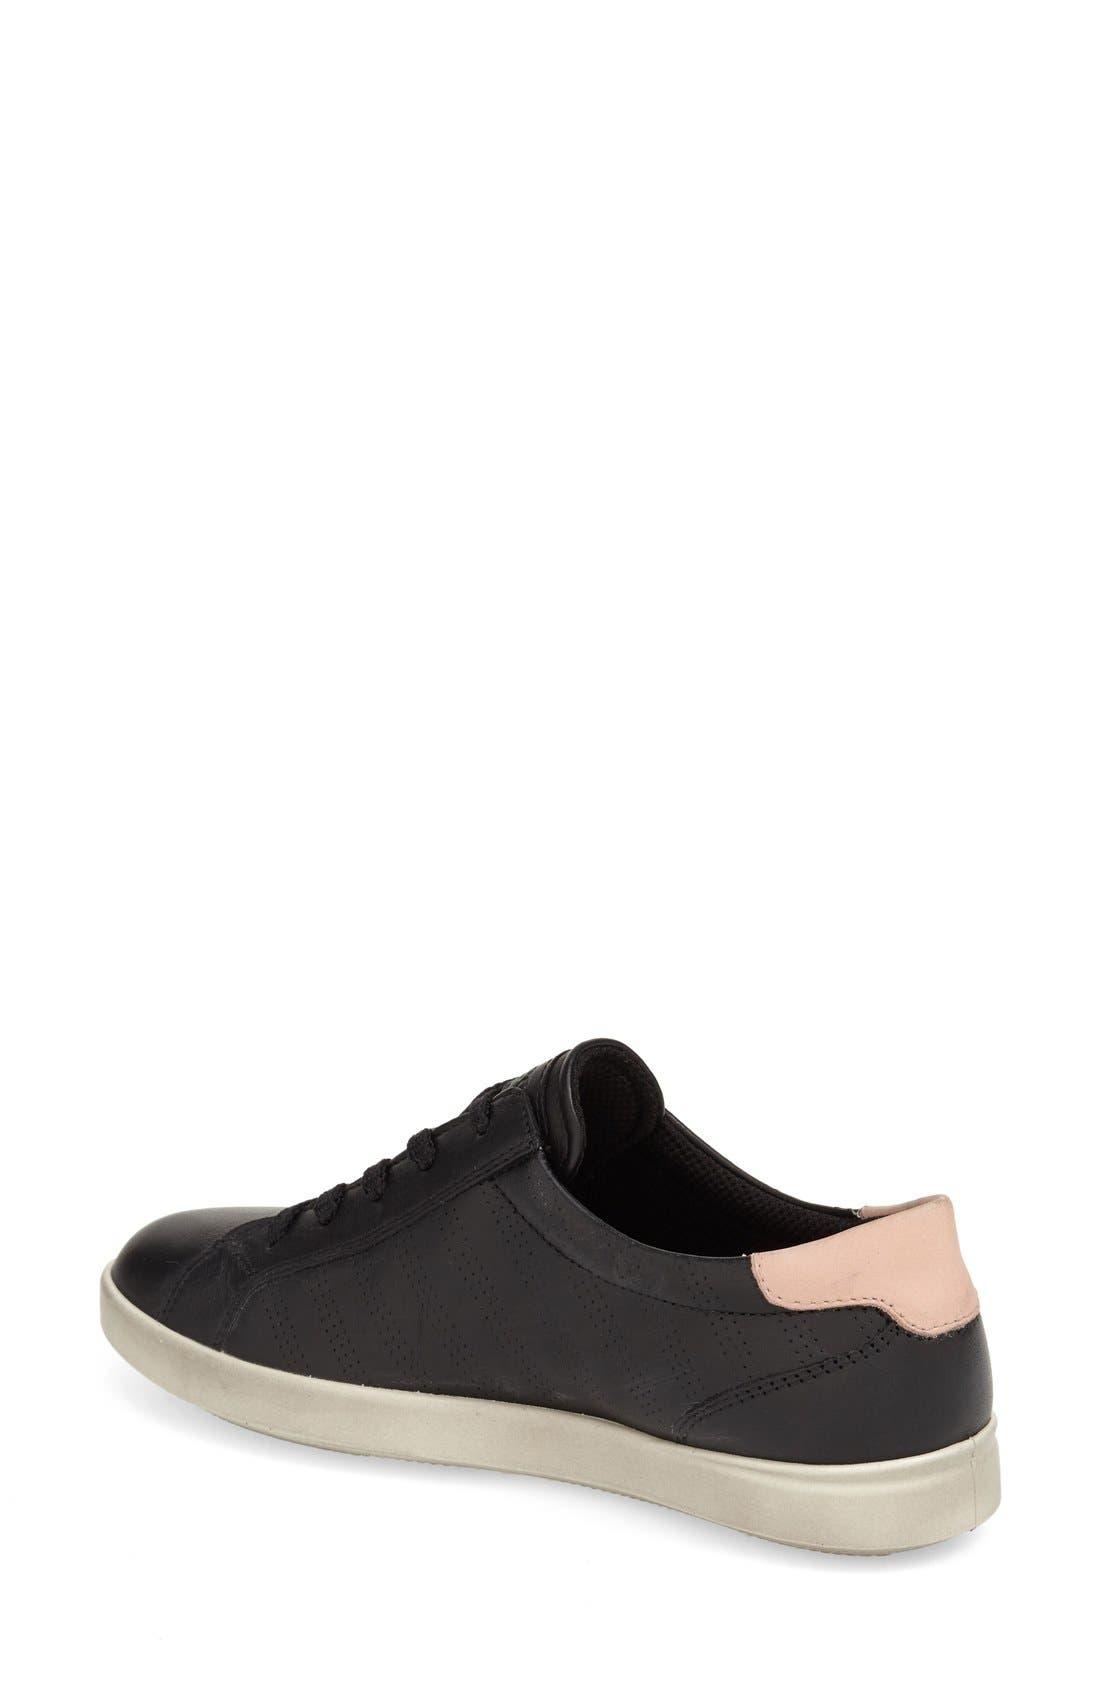 Alternate Image 2  - ECCO 'Amiee' Sneaker (Women)